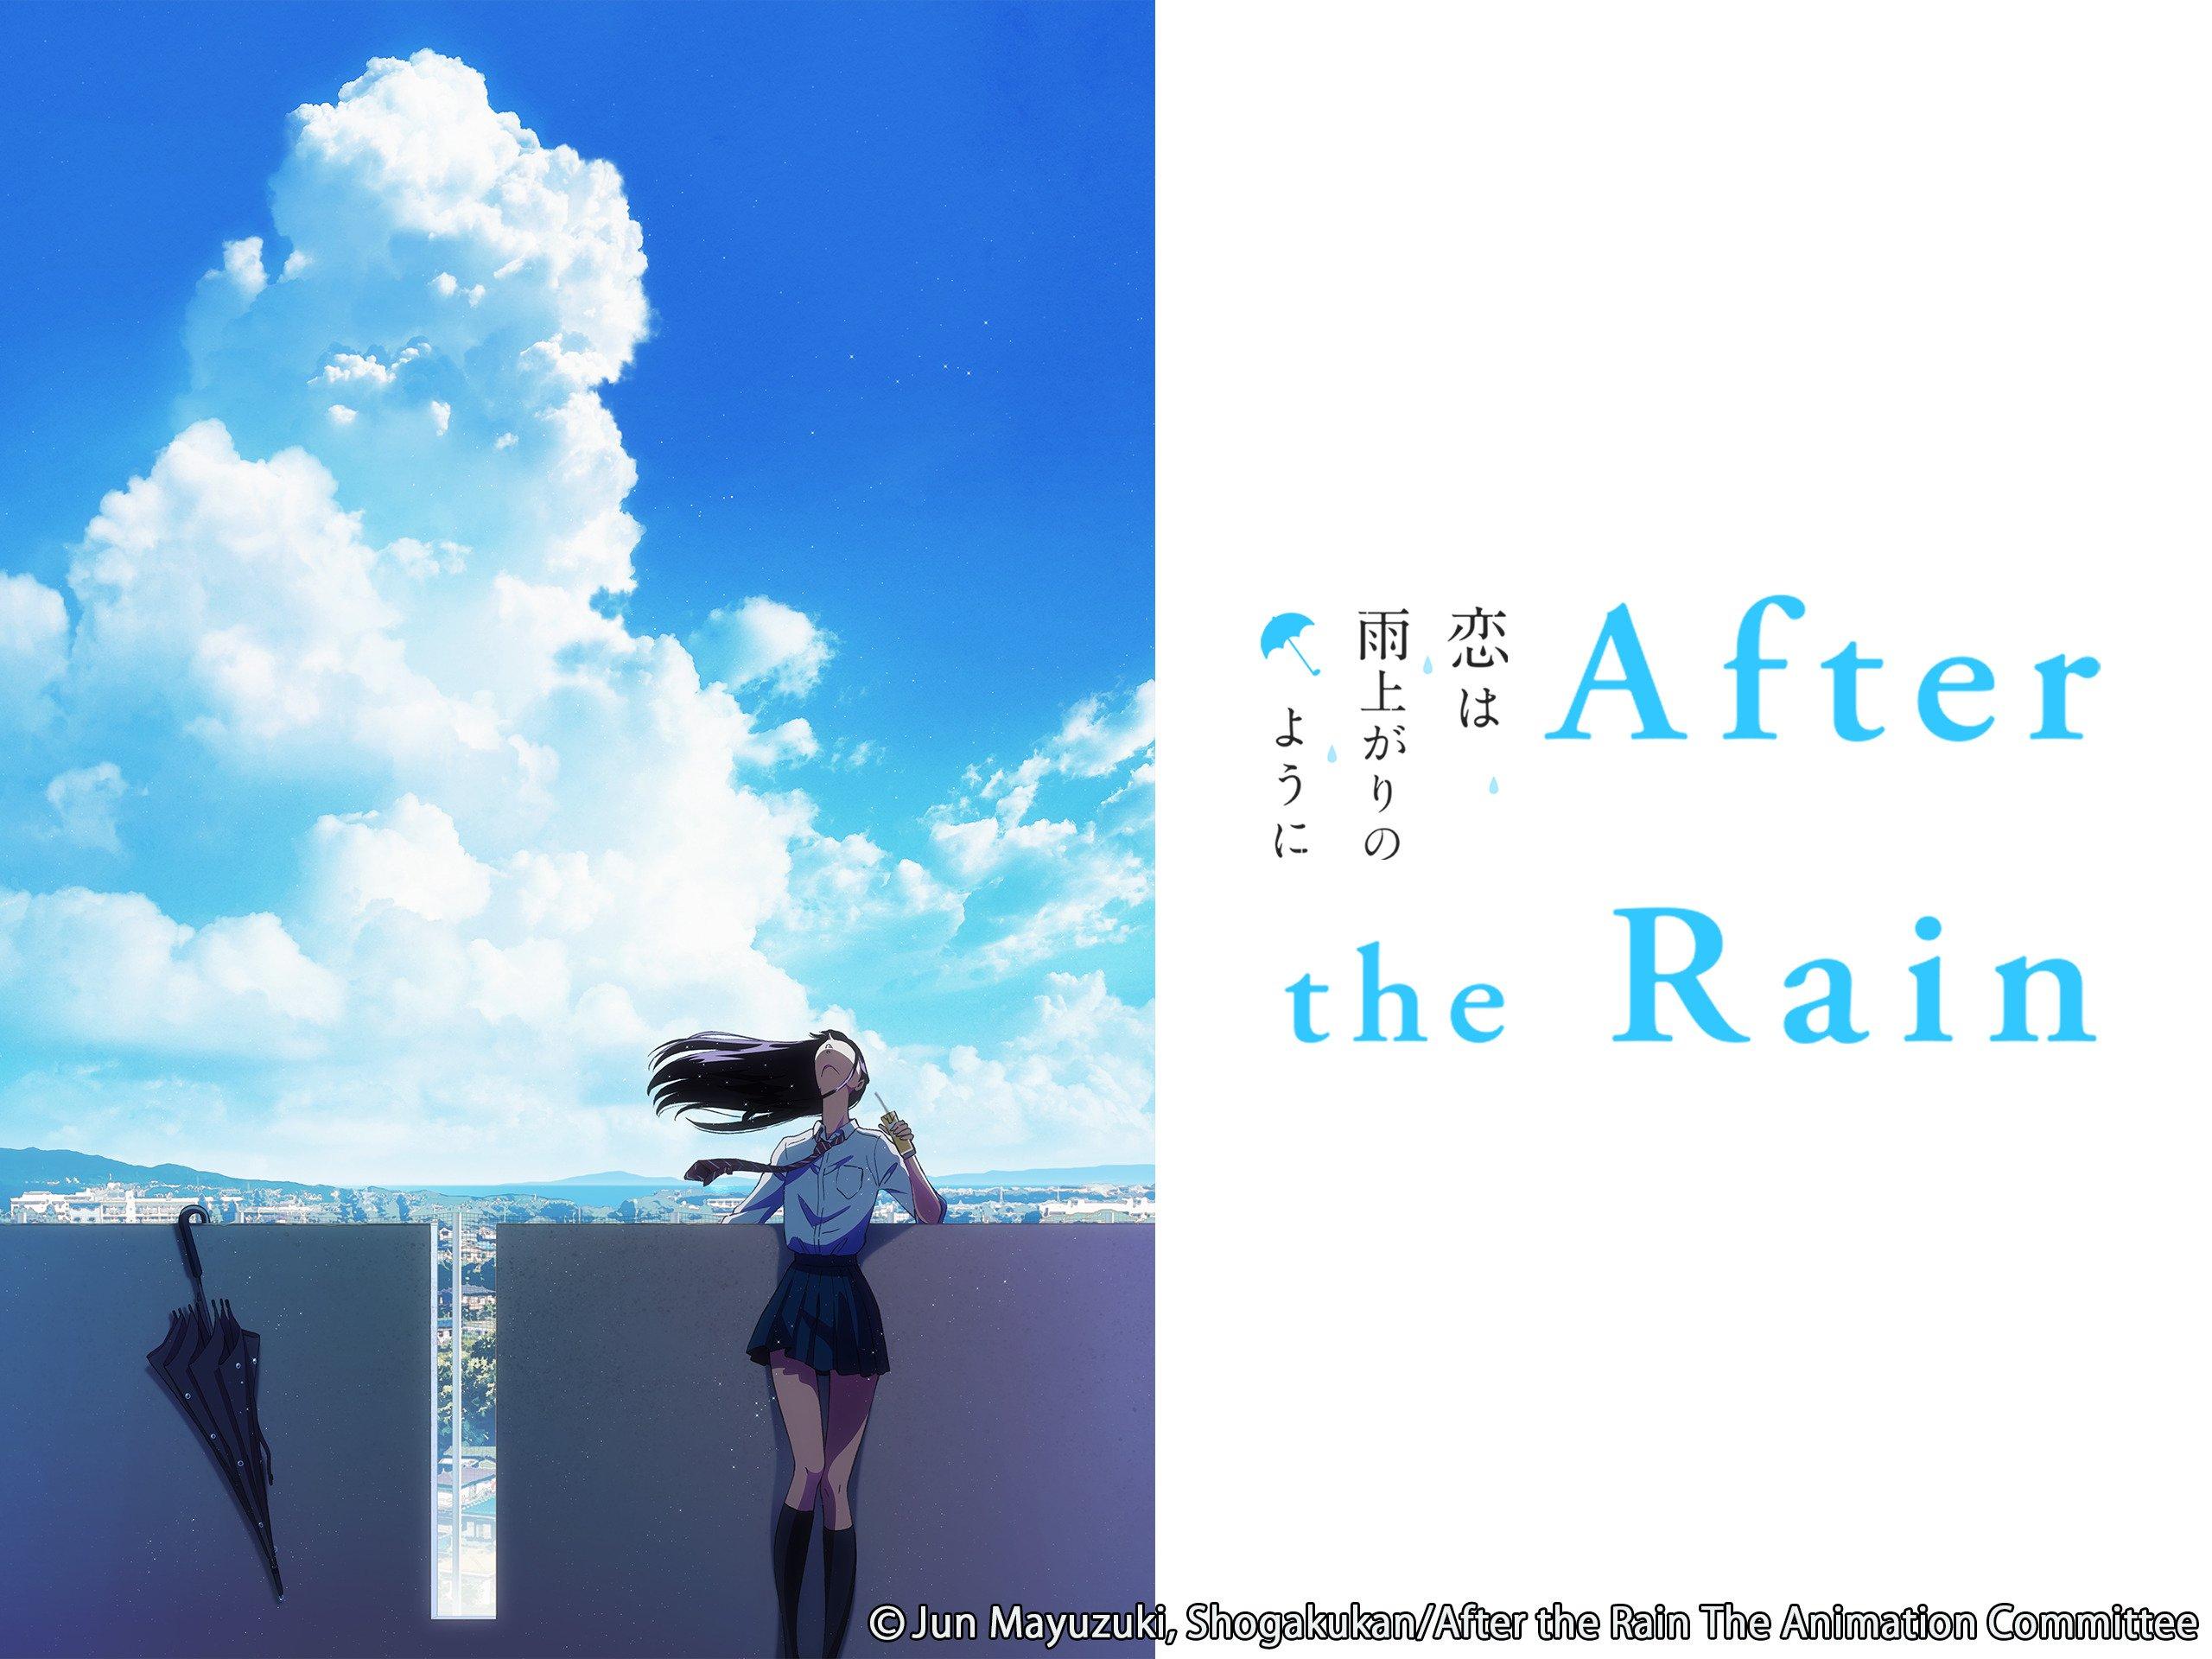 After the Rain - Season 1